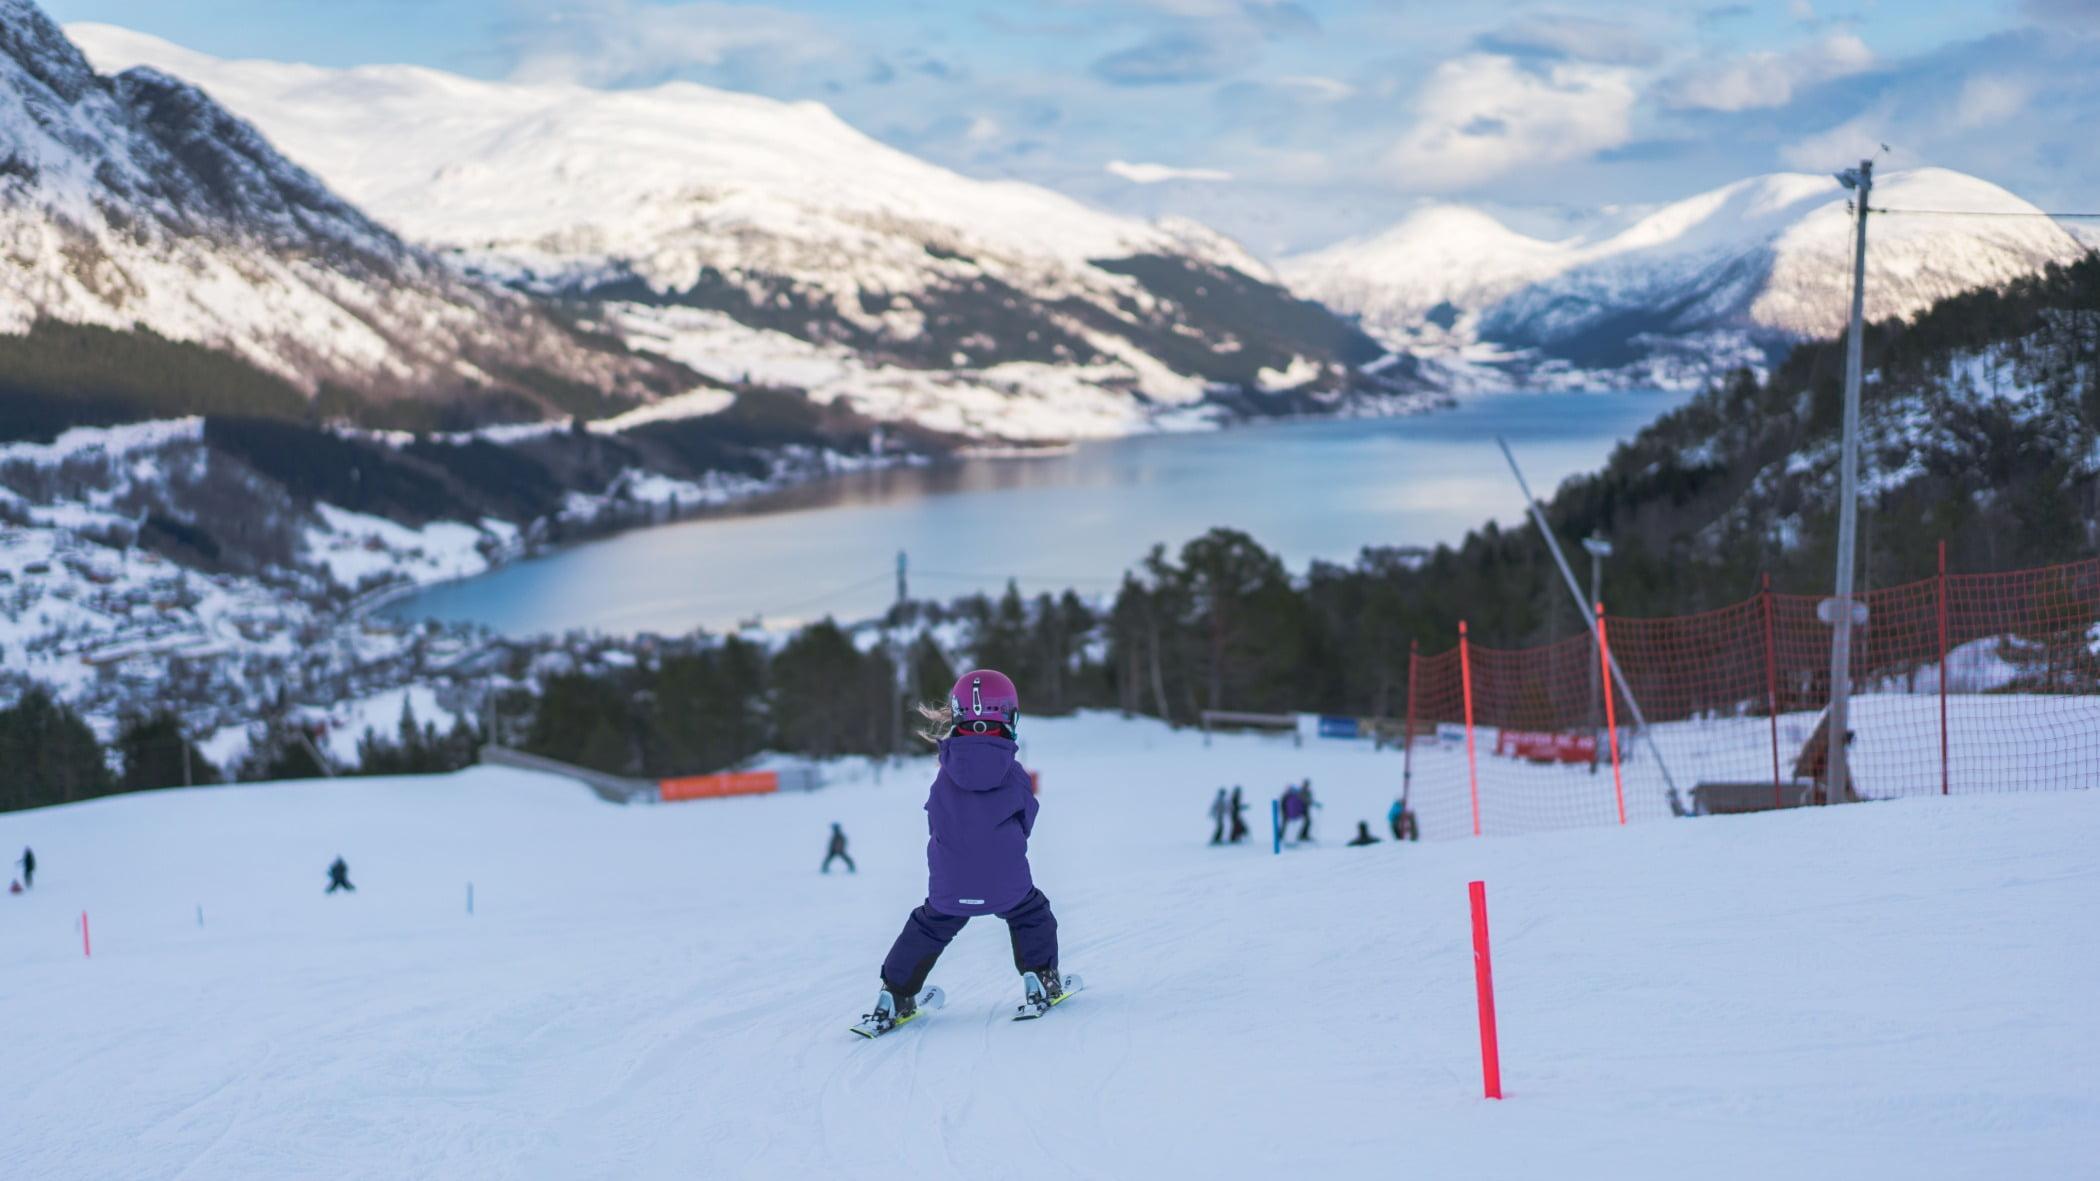 Outdoor recreation, Mountain range, Mountainous landforms, Winter sport, Leisure, Hill, Snow, Slope